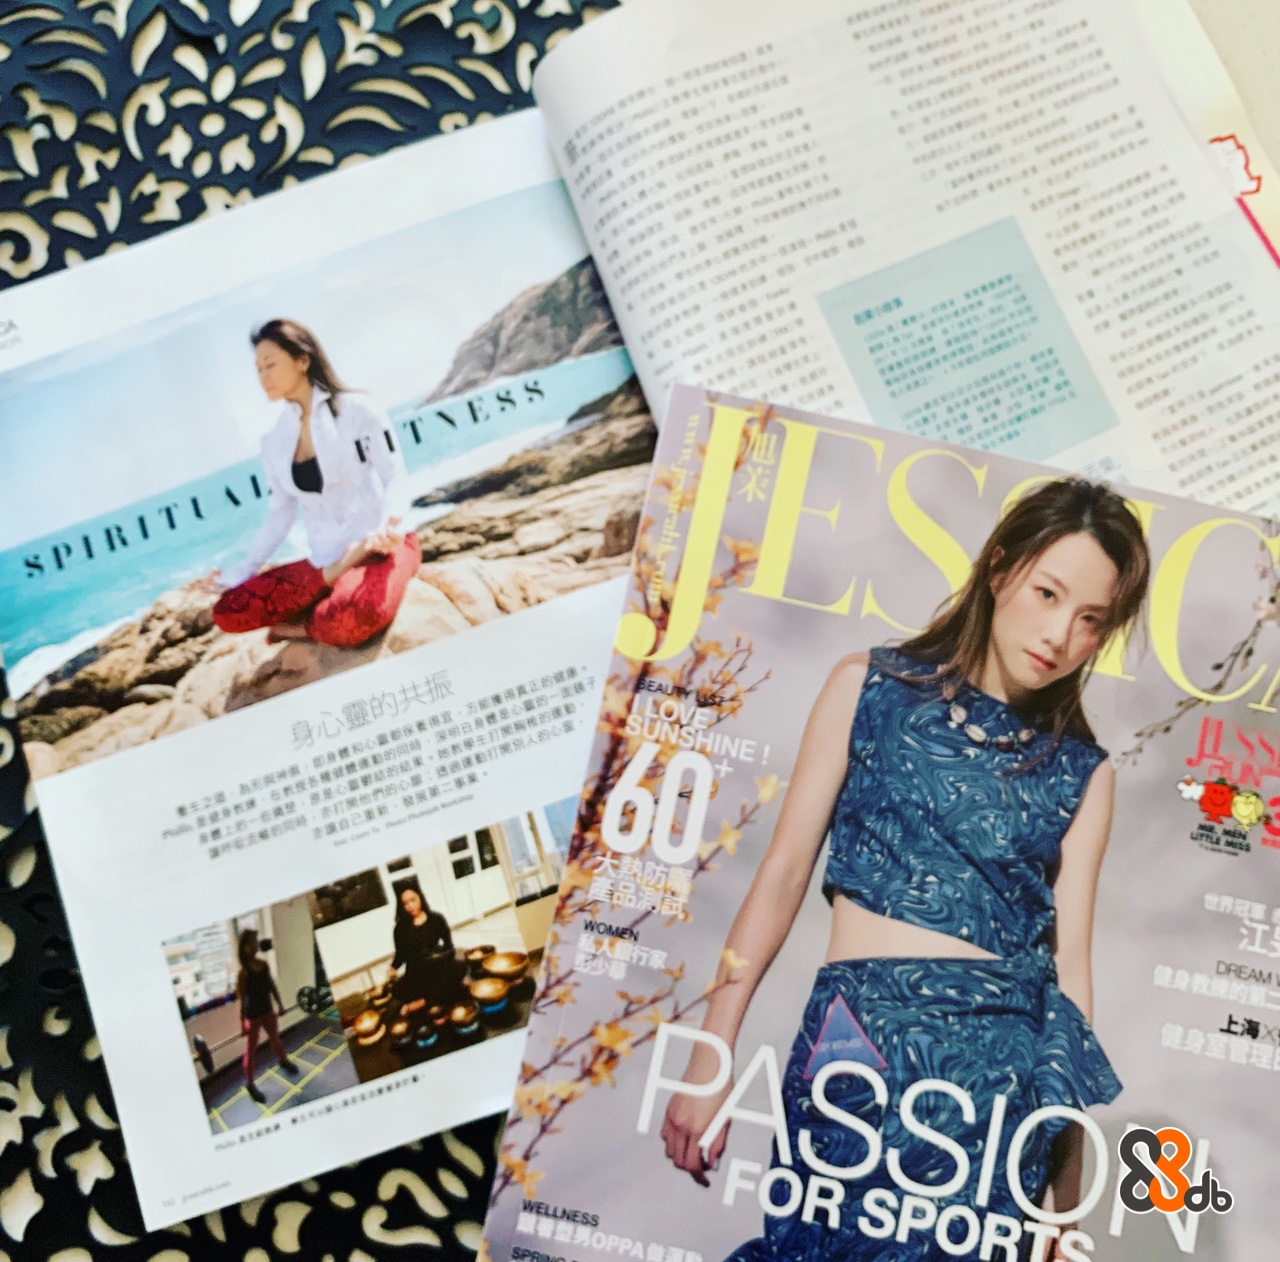 FITNESS 身心靈的共振 NSHINE OR SPORTS  Magazine,Fashion,Design,Pattern,Pattern